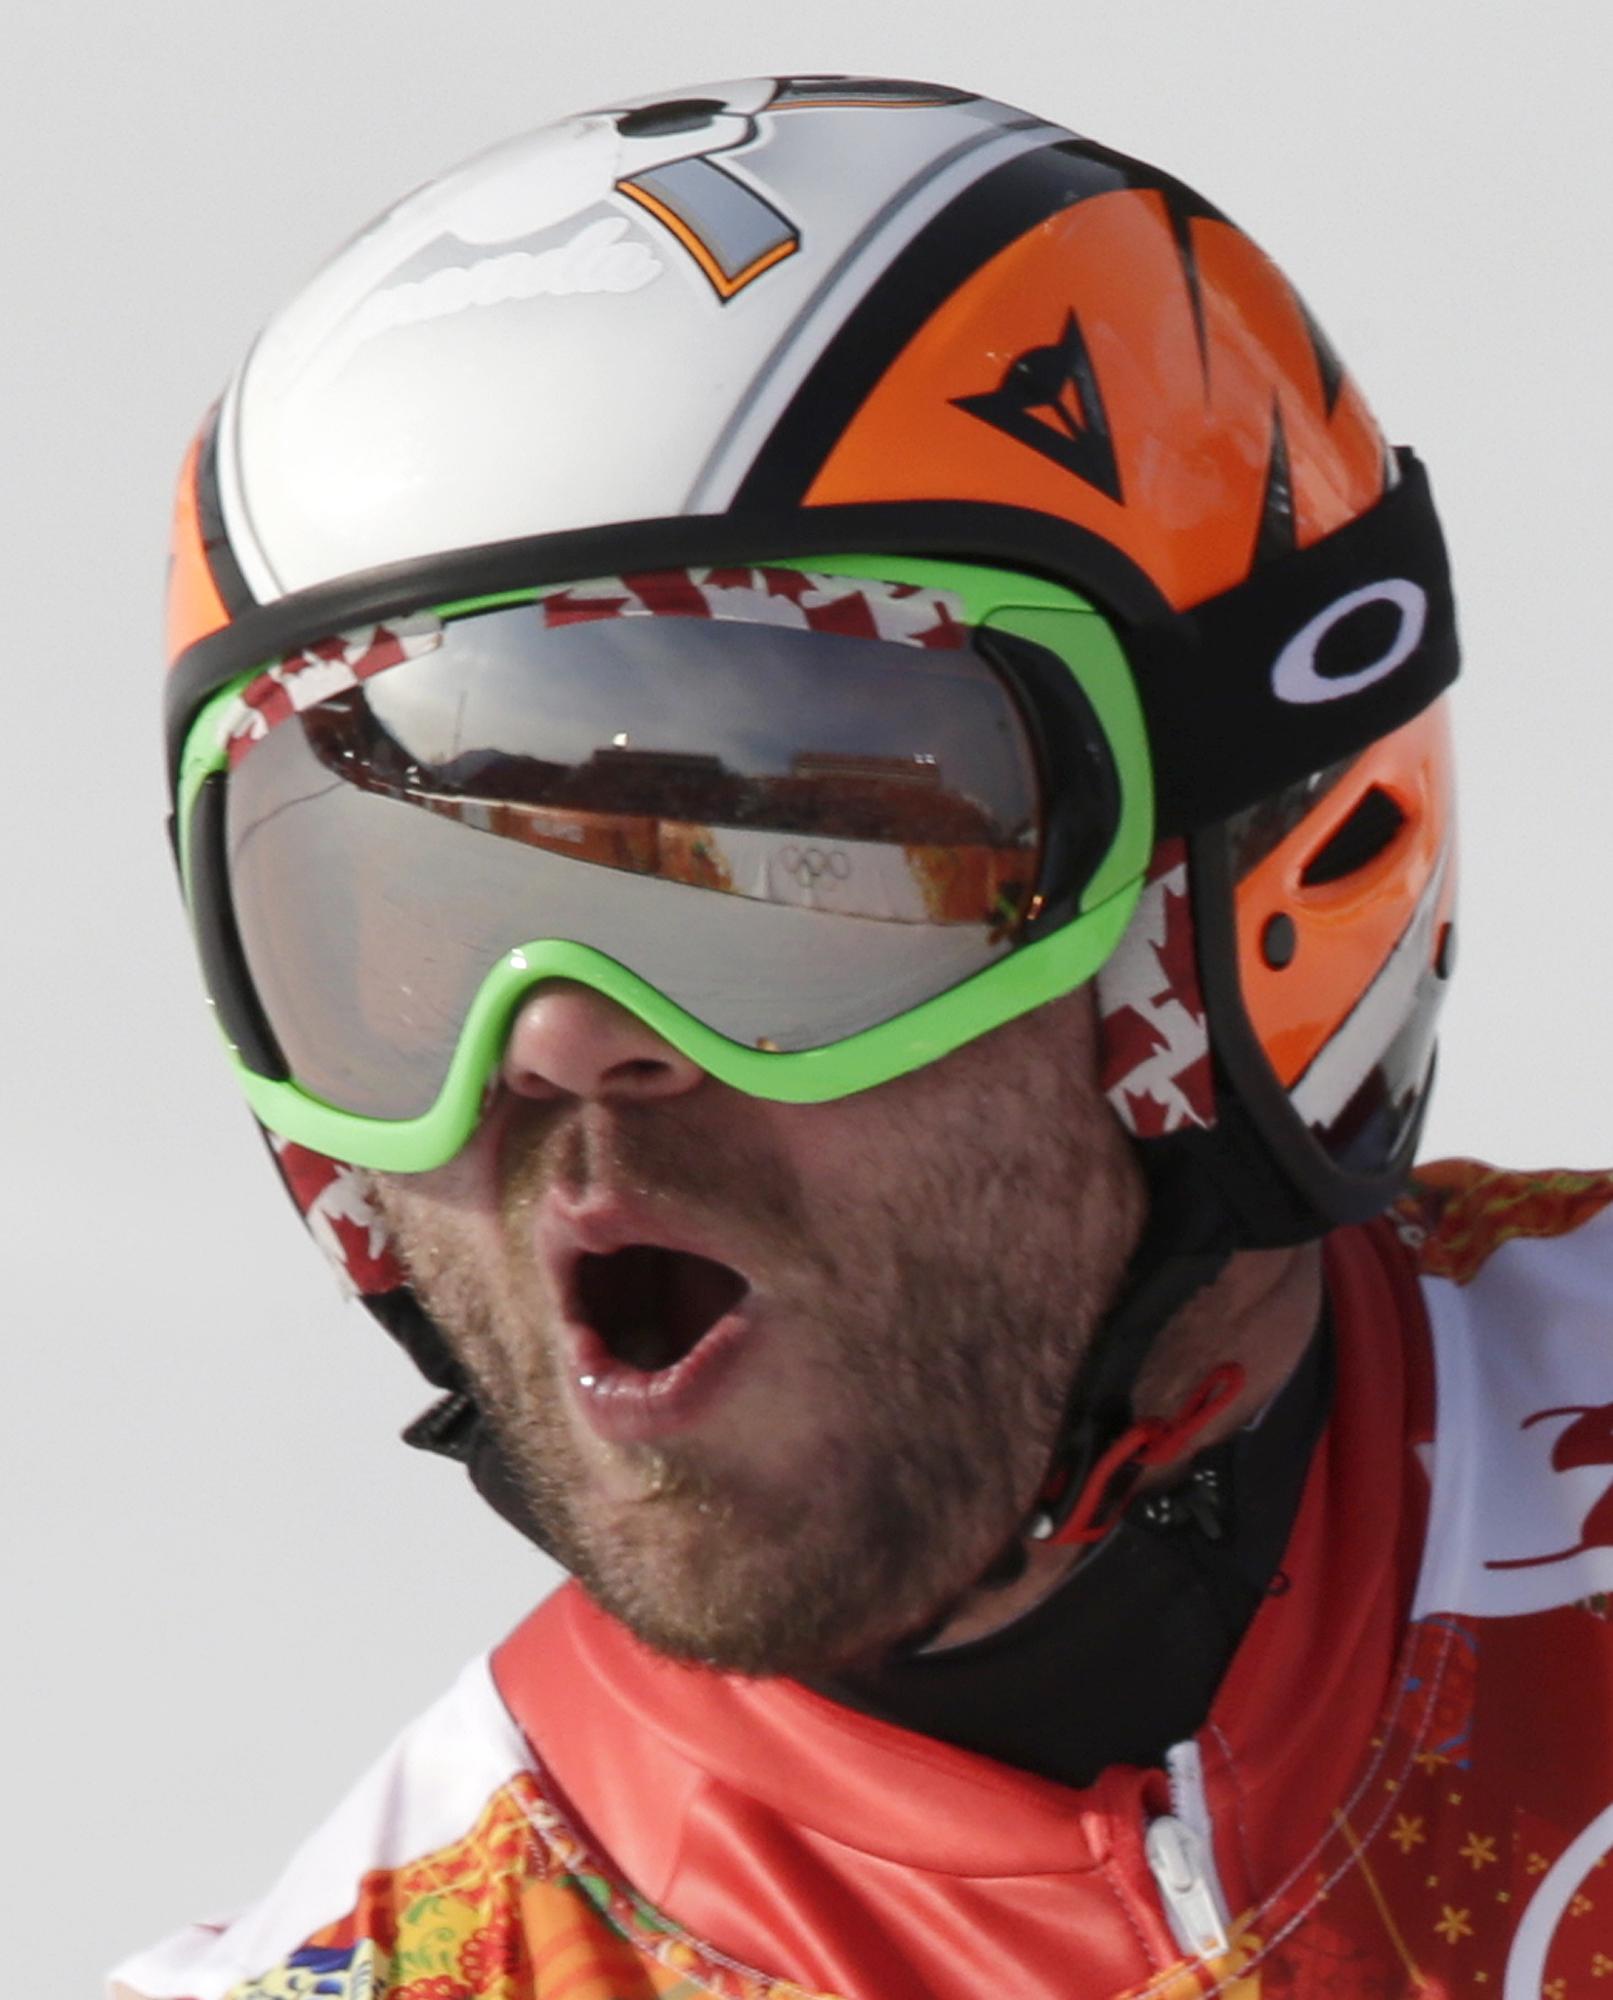 Canada's Jan Hudec celebrates after his run in the men's super-G at the Sochi 2014 Winter Olympics, Sunday, Feb. 16, 2014, in Krasnaya Polyana, Russia.(AP Photo/Gero Breloer)